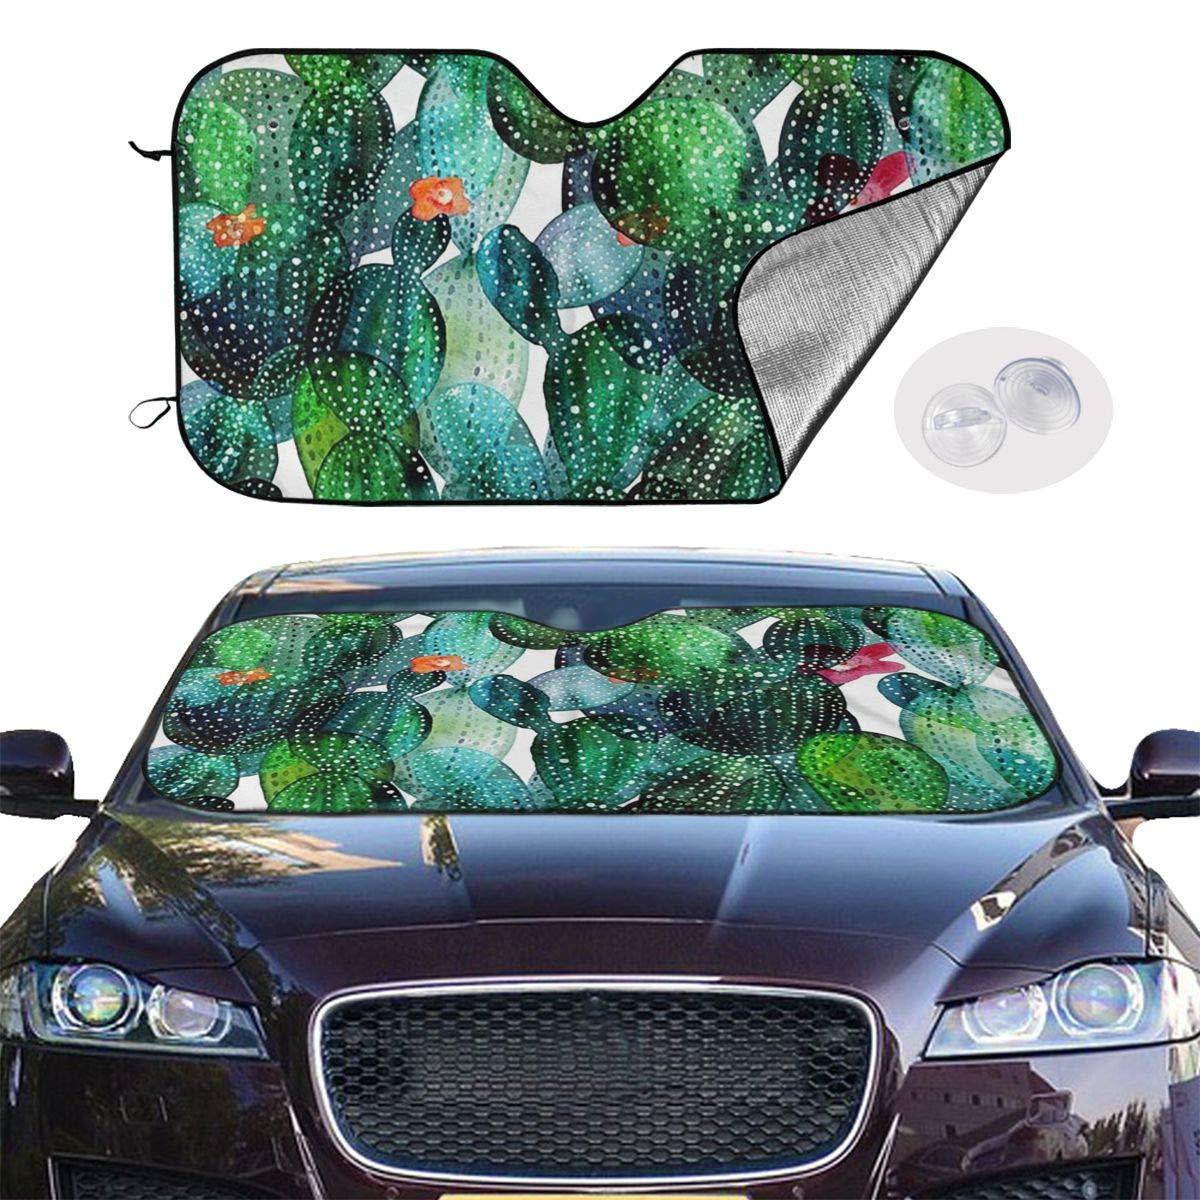 Windshield Sunshade for Car Foldable UV Ray Reflector Auto Front Window Sun Shade Visor Shield Cover, Keeps Vehicle Cool, Cactus 45 by Sha-de